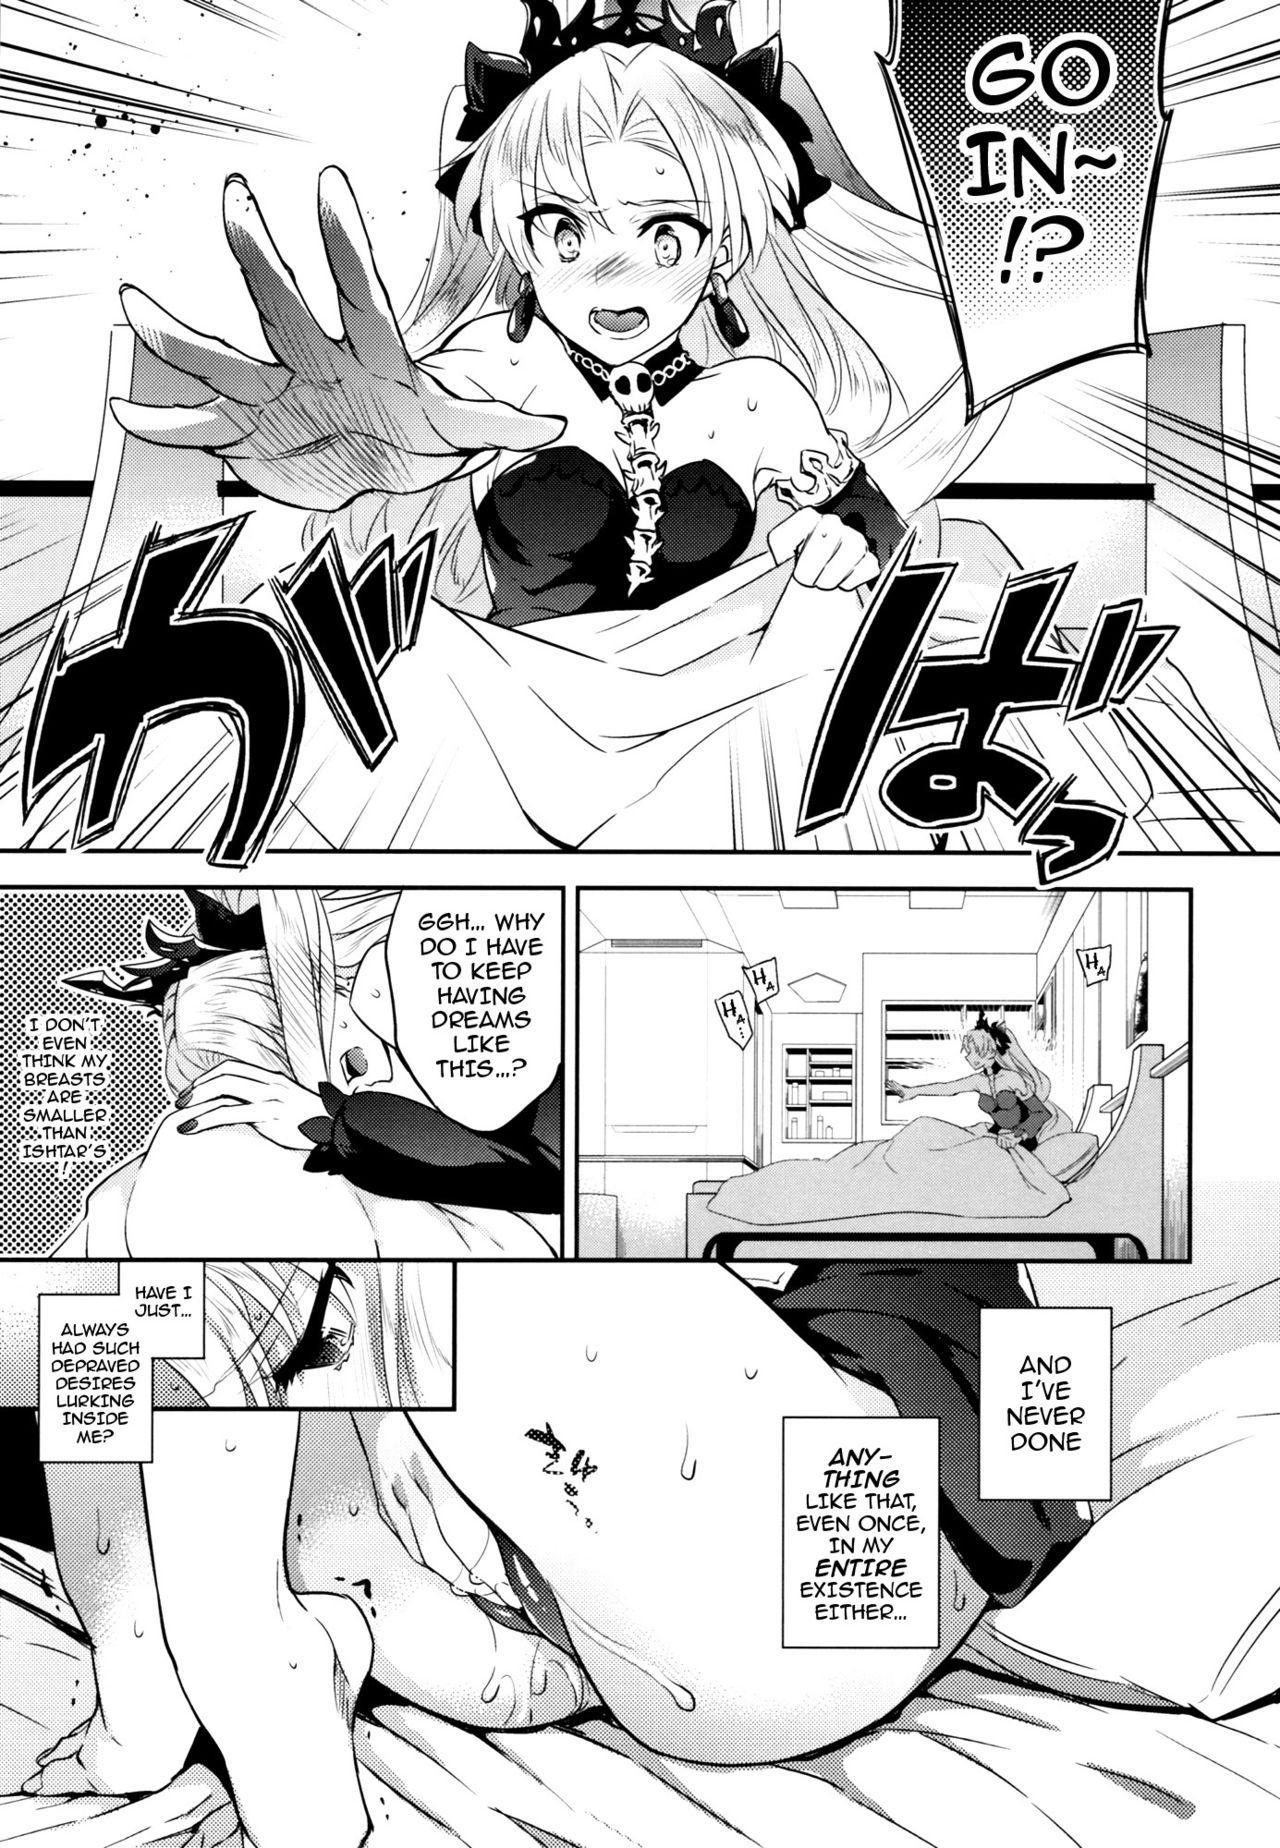 (C93) [Crazy9 (Ichitaka)] C9-33 Megami-sama no Hajimete Ereshkigal no Baai | The Goddess's First Time: The Tale of Ereshkigal (Fate/Grand Order) [English] {darknight} 8